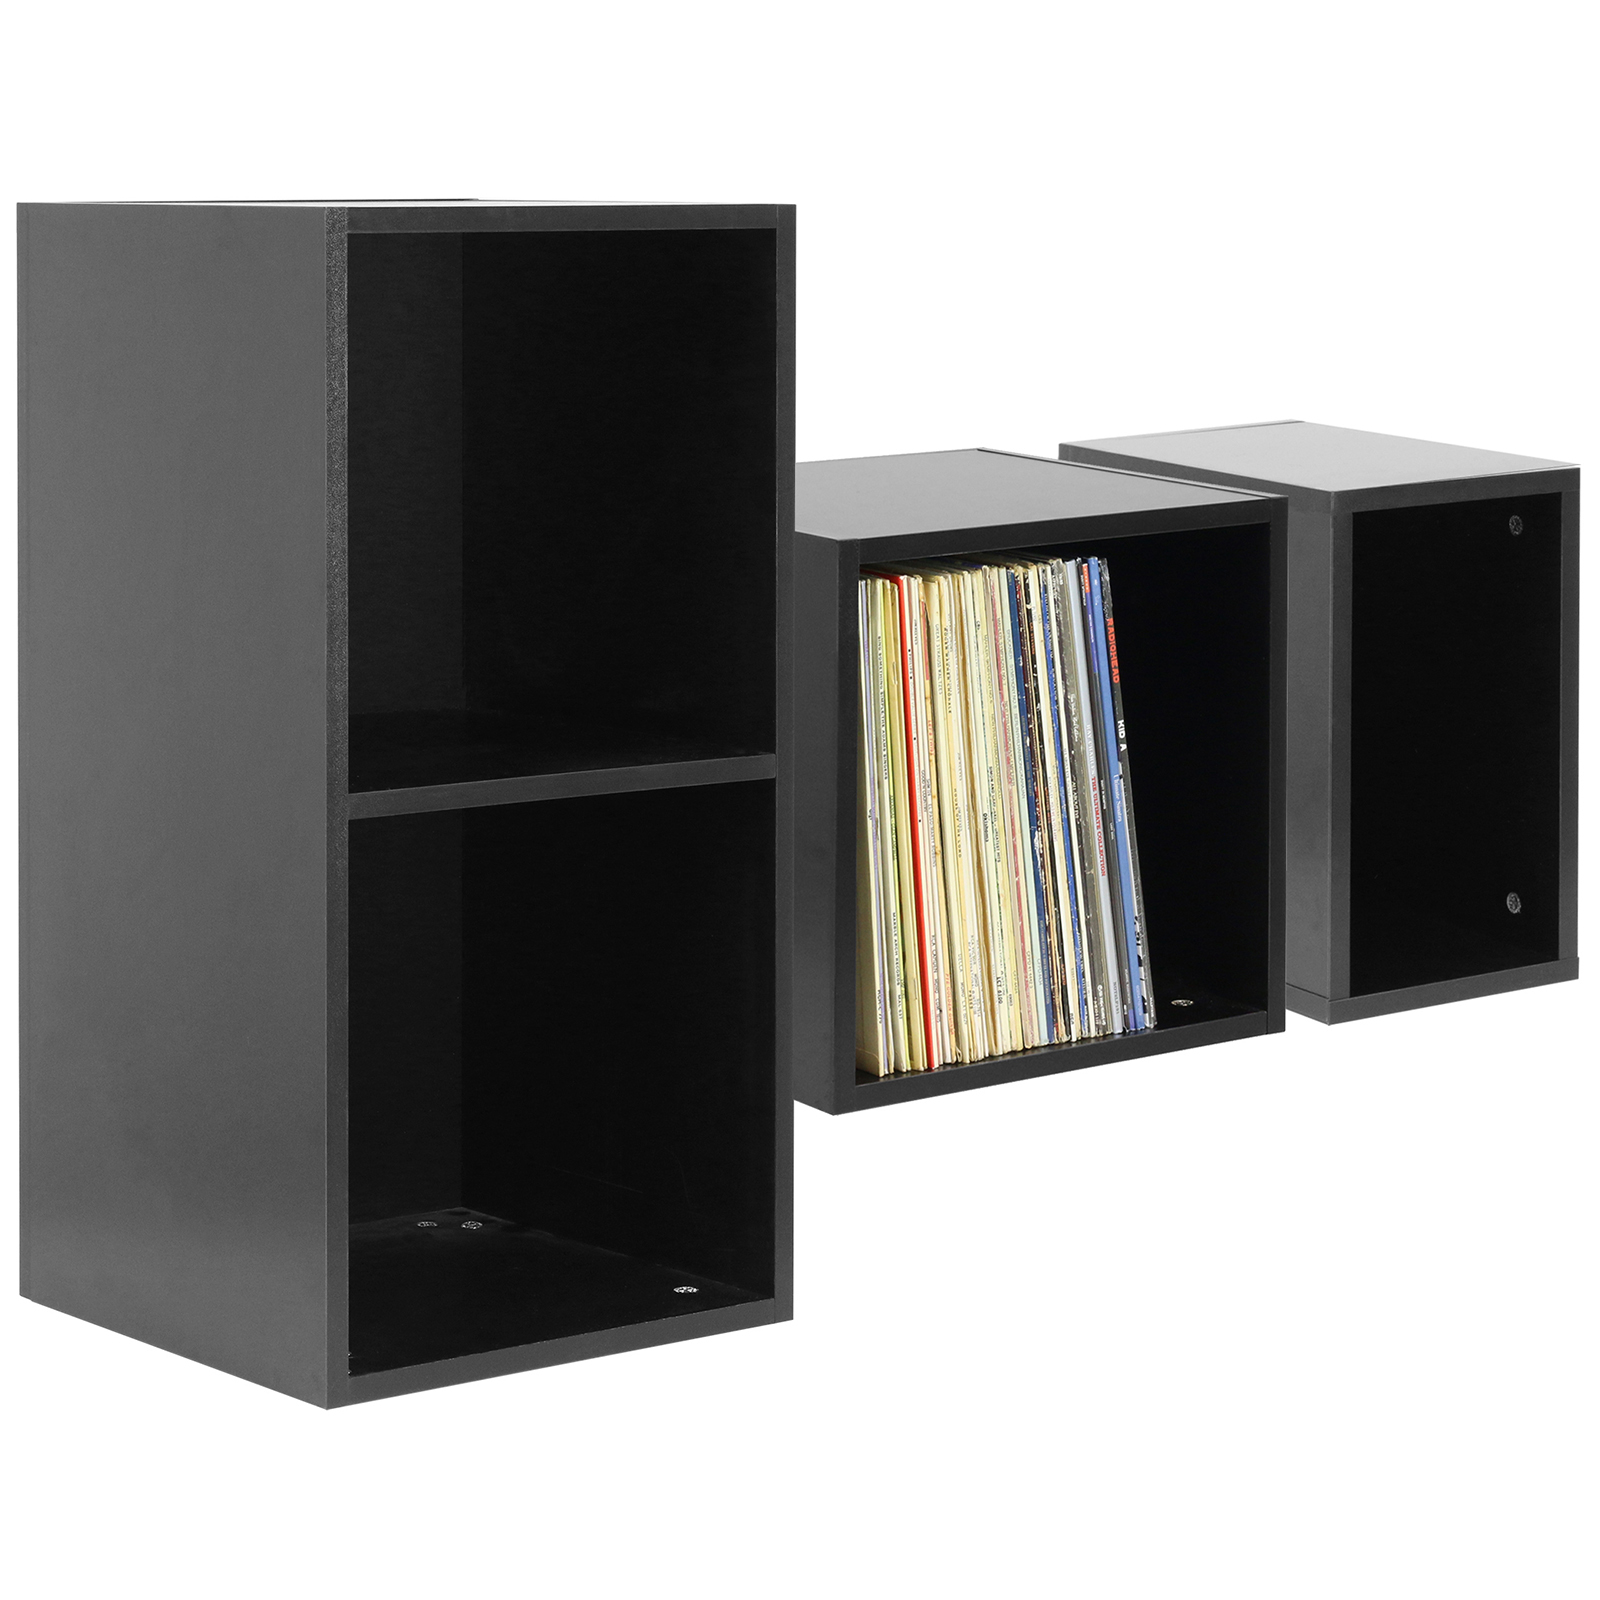 hartleys black vinyl lp music record storage box cube 12 case dj studio cabinet ebay. Black Bedroom Furniture Sets. Home Design Ideas